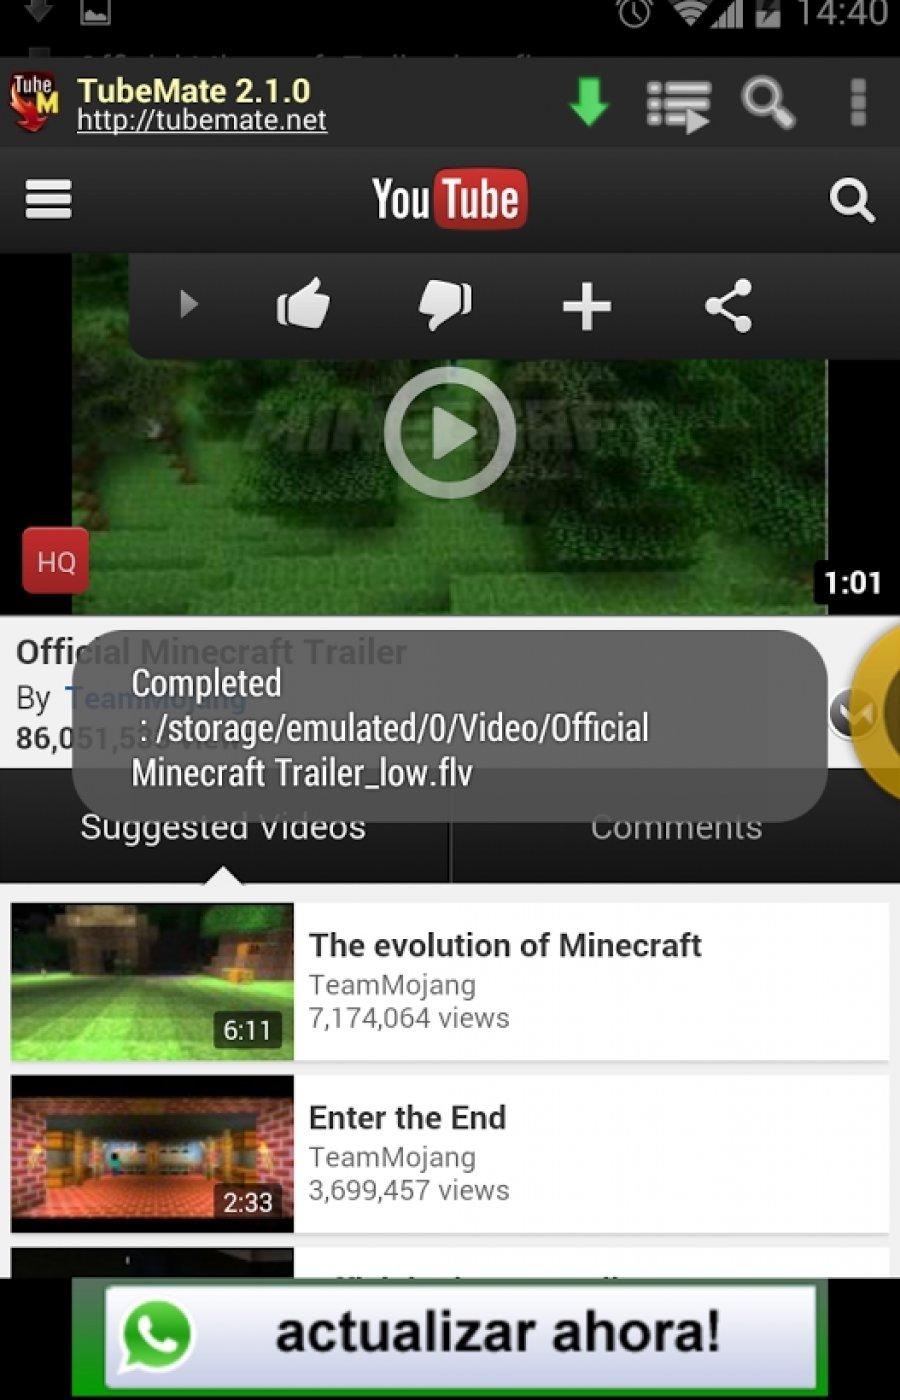 YouTube Downloader Tubemate apk for Android mobile or tablet. | Nepali Internet Tricks